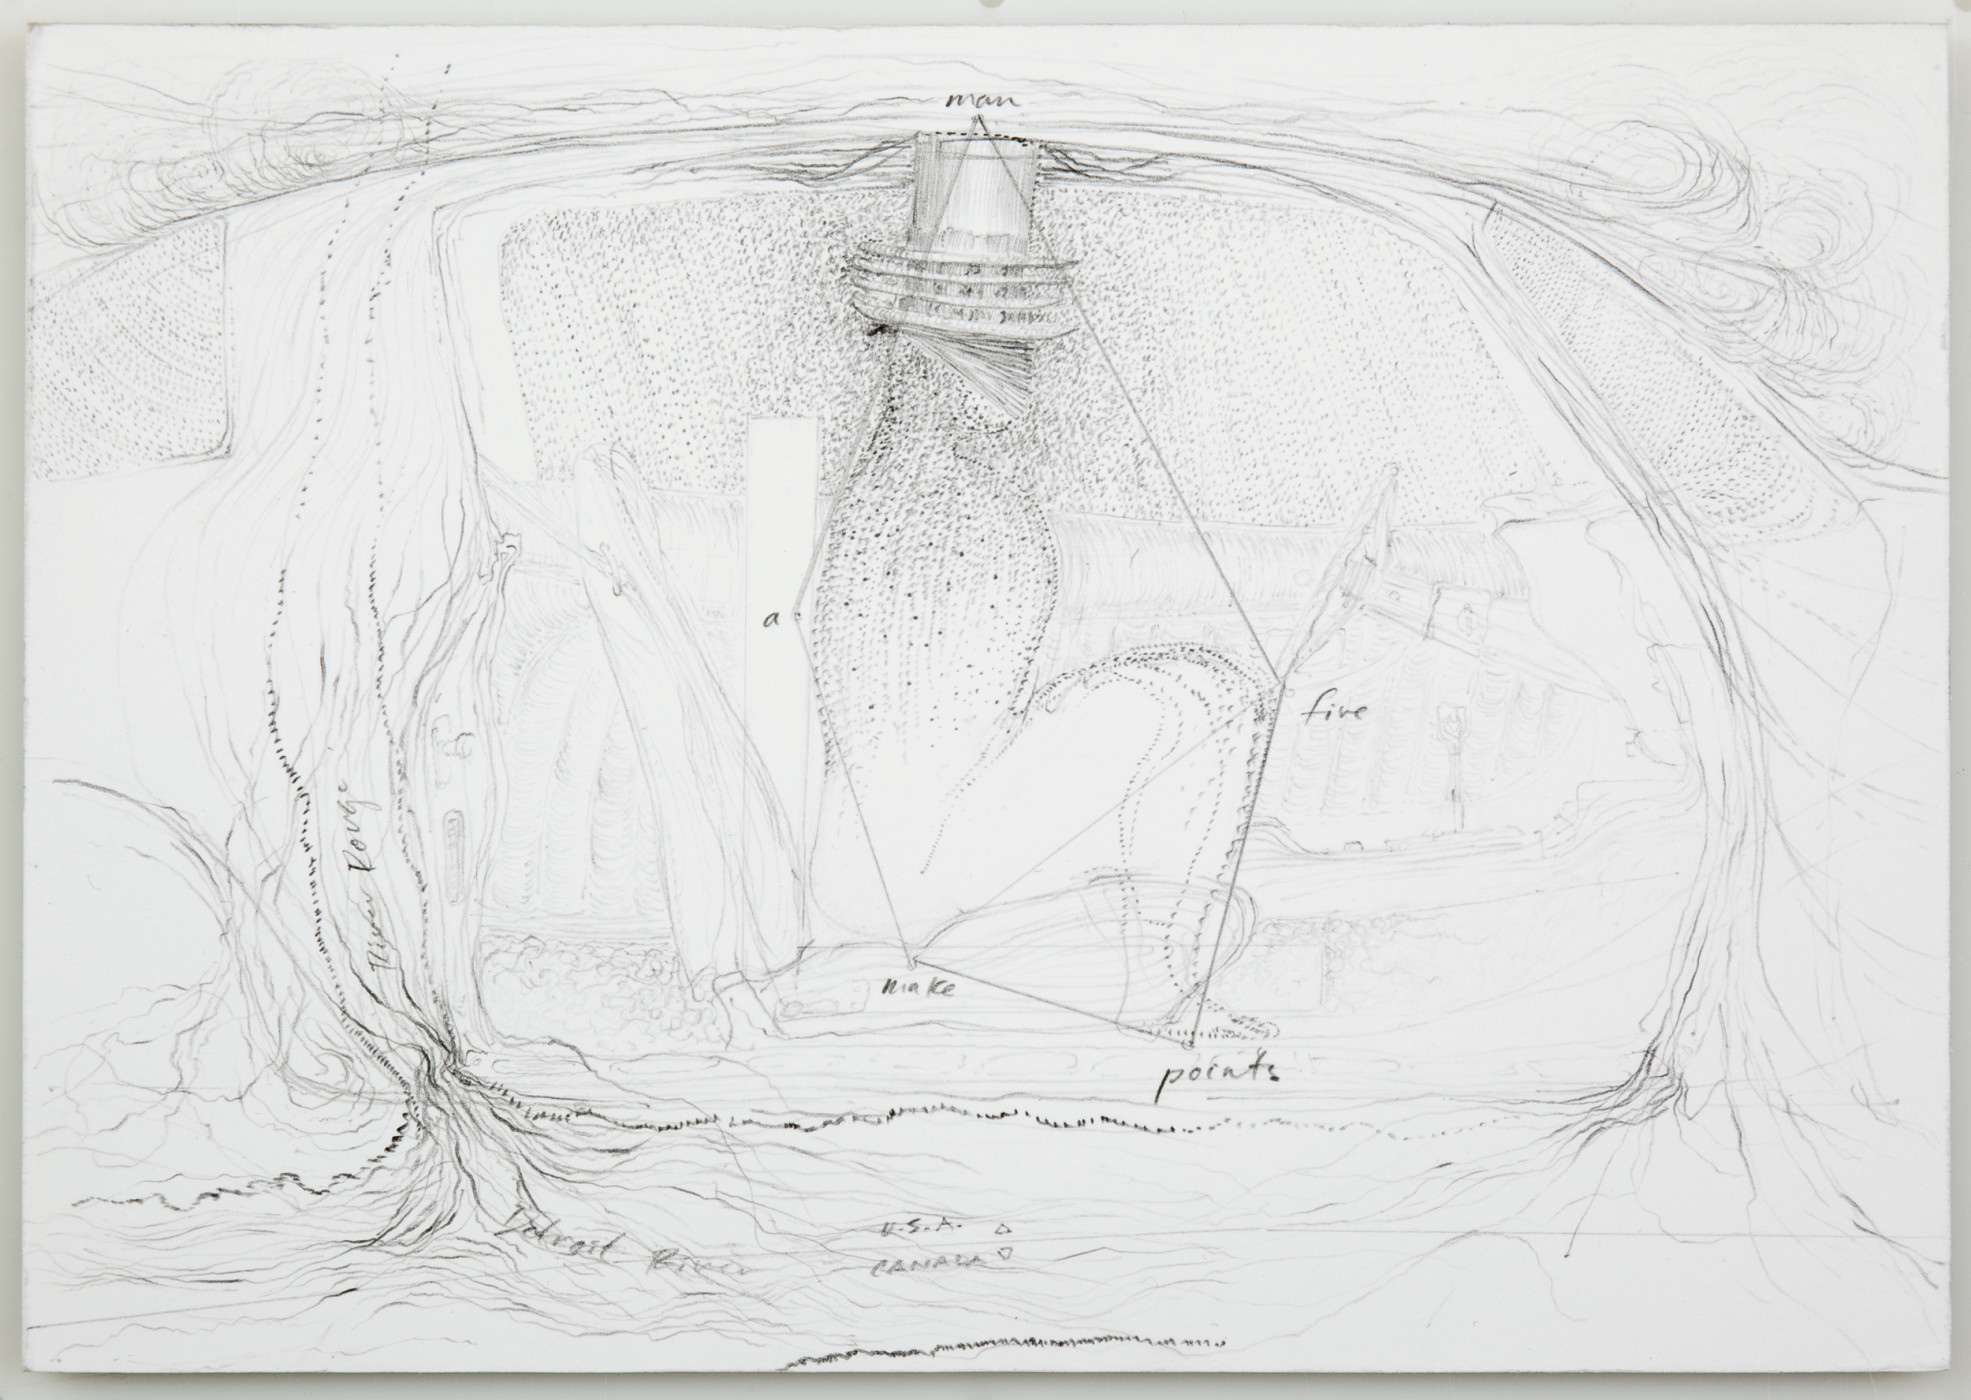 "<div class=""artwork_caption""><p>KHU: Five Points Make a Man, 2009</p></div>"